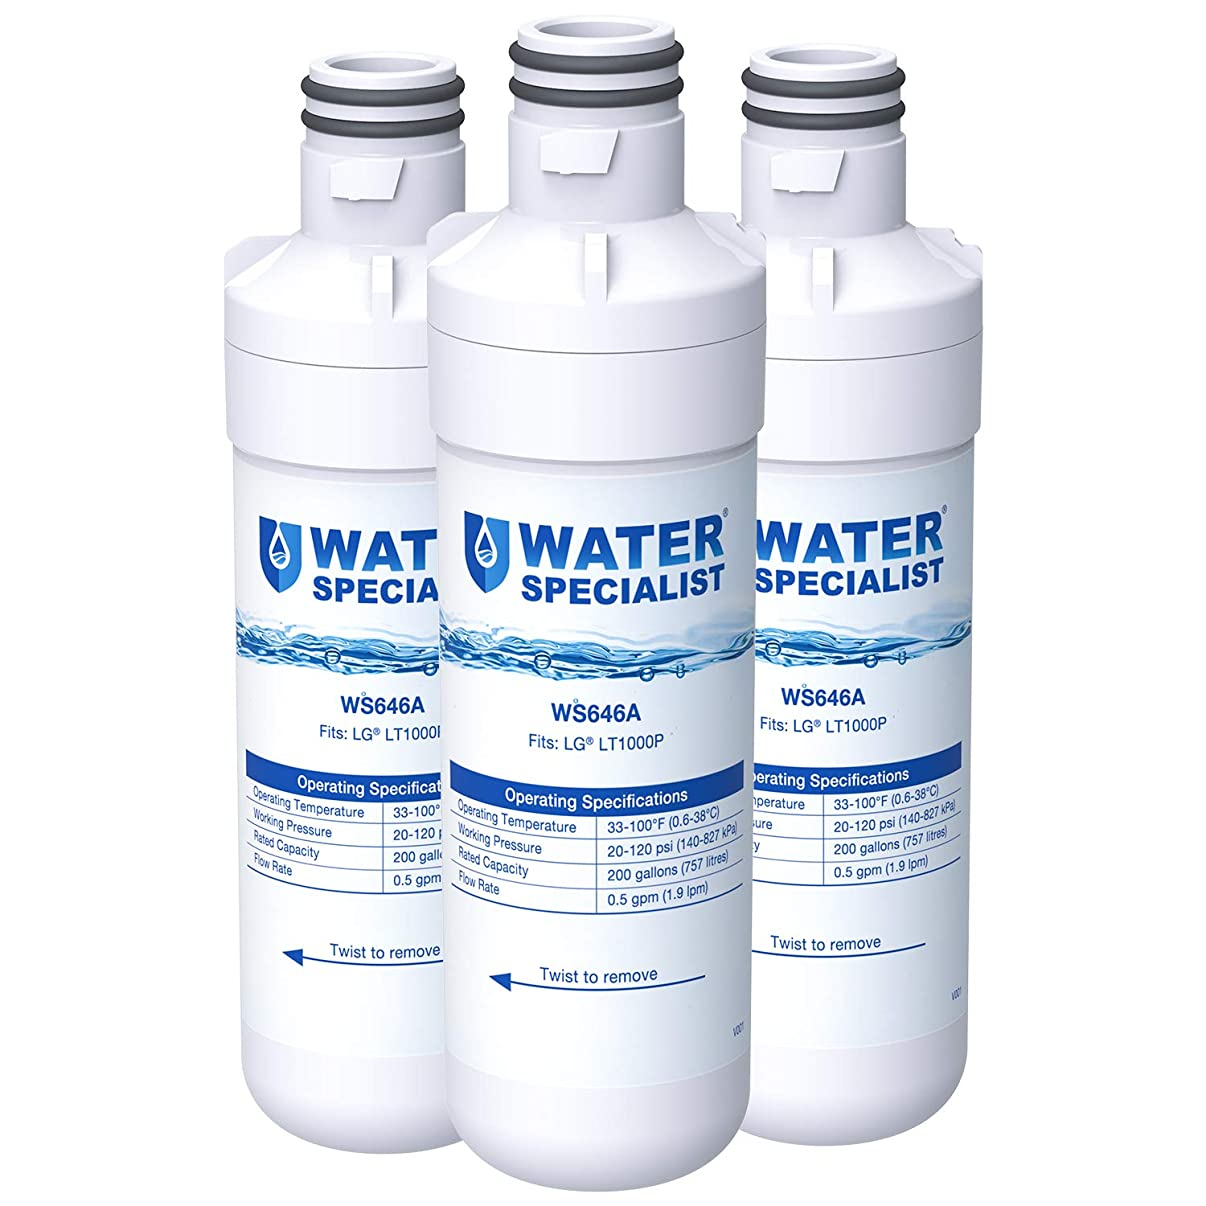 Waterspecialist MDJ64844601 Refrigerator Water Filter, Replacement for LG LT1000P, LT 1000P, LT1000PC, LT1000PCS, LFXC24796S, LSFXC2496D, ADQ74793501, ADQ74793502, Kenmore 46-9980, 9980 (Pack of 3)